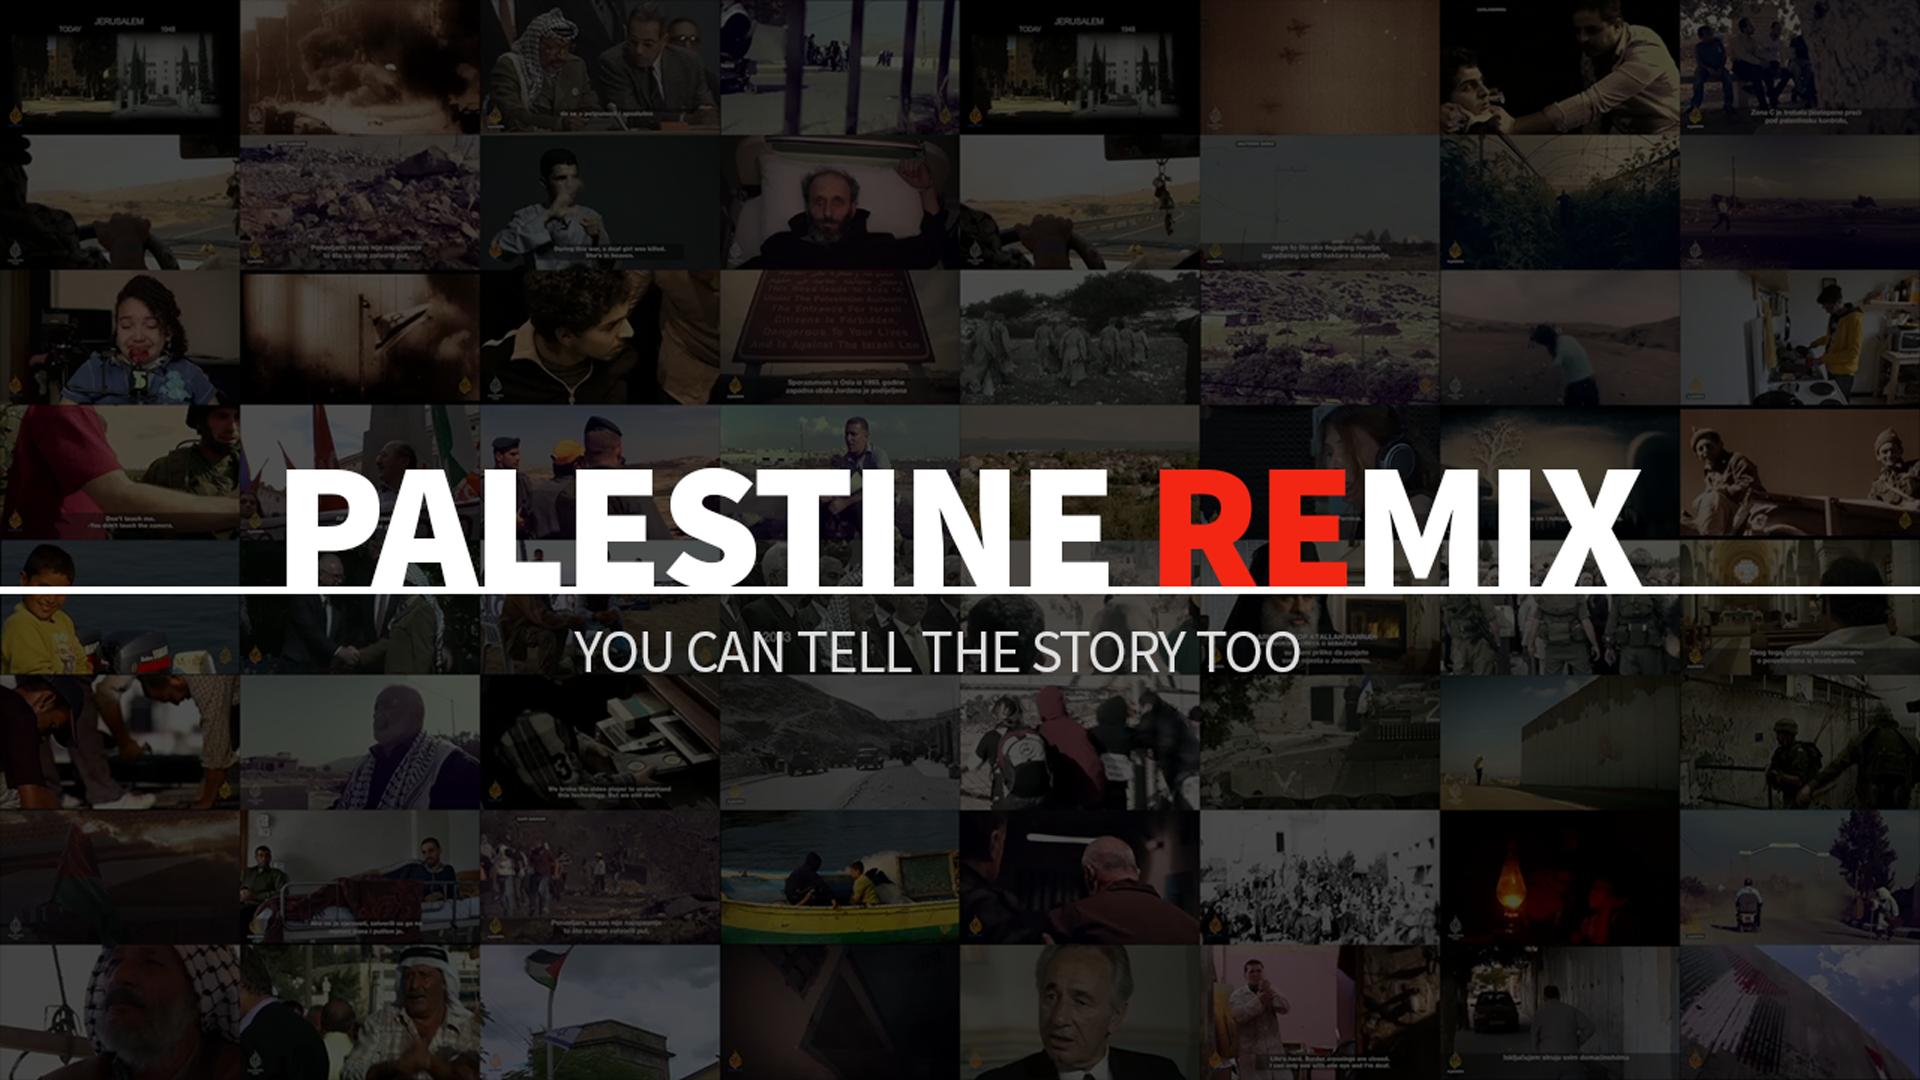 Palestine Remix. Source: Al Jazeera